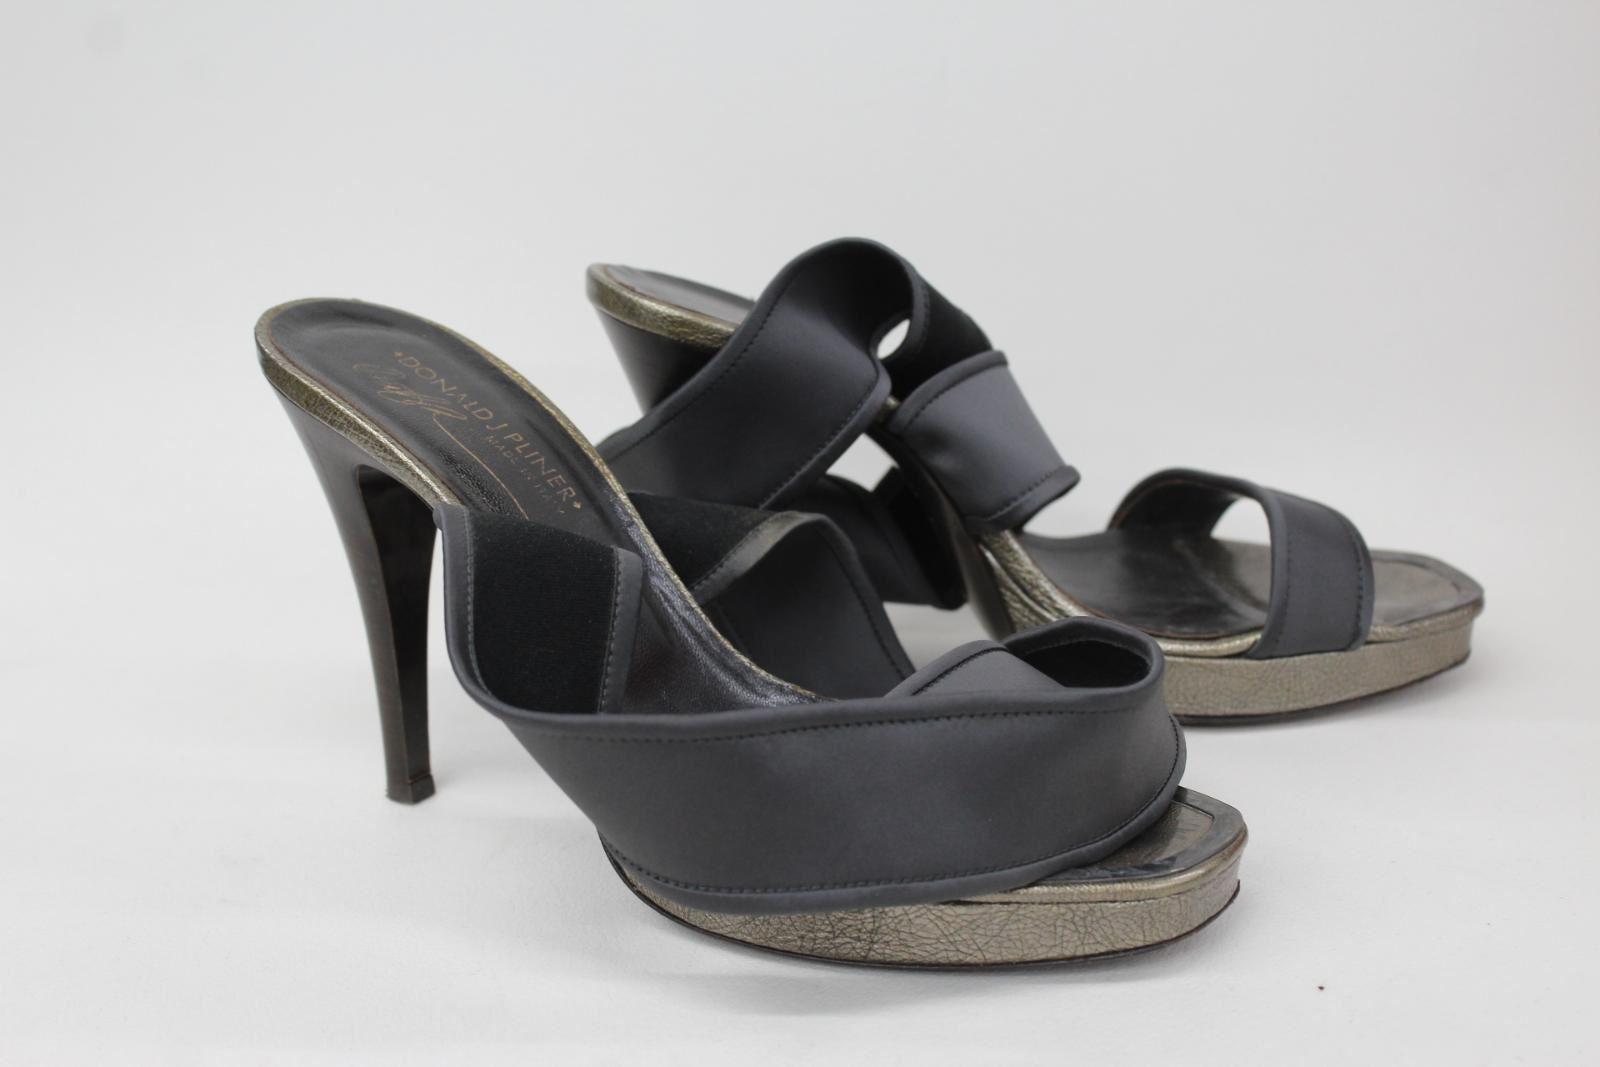 DONALD J PLINER Ladies Grey Satin Wraparound Ankle Strap Sandal shoes UK7 US9M